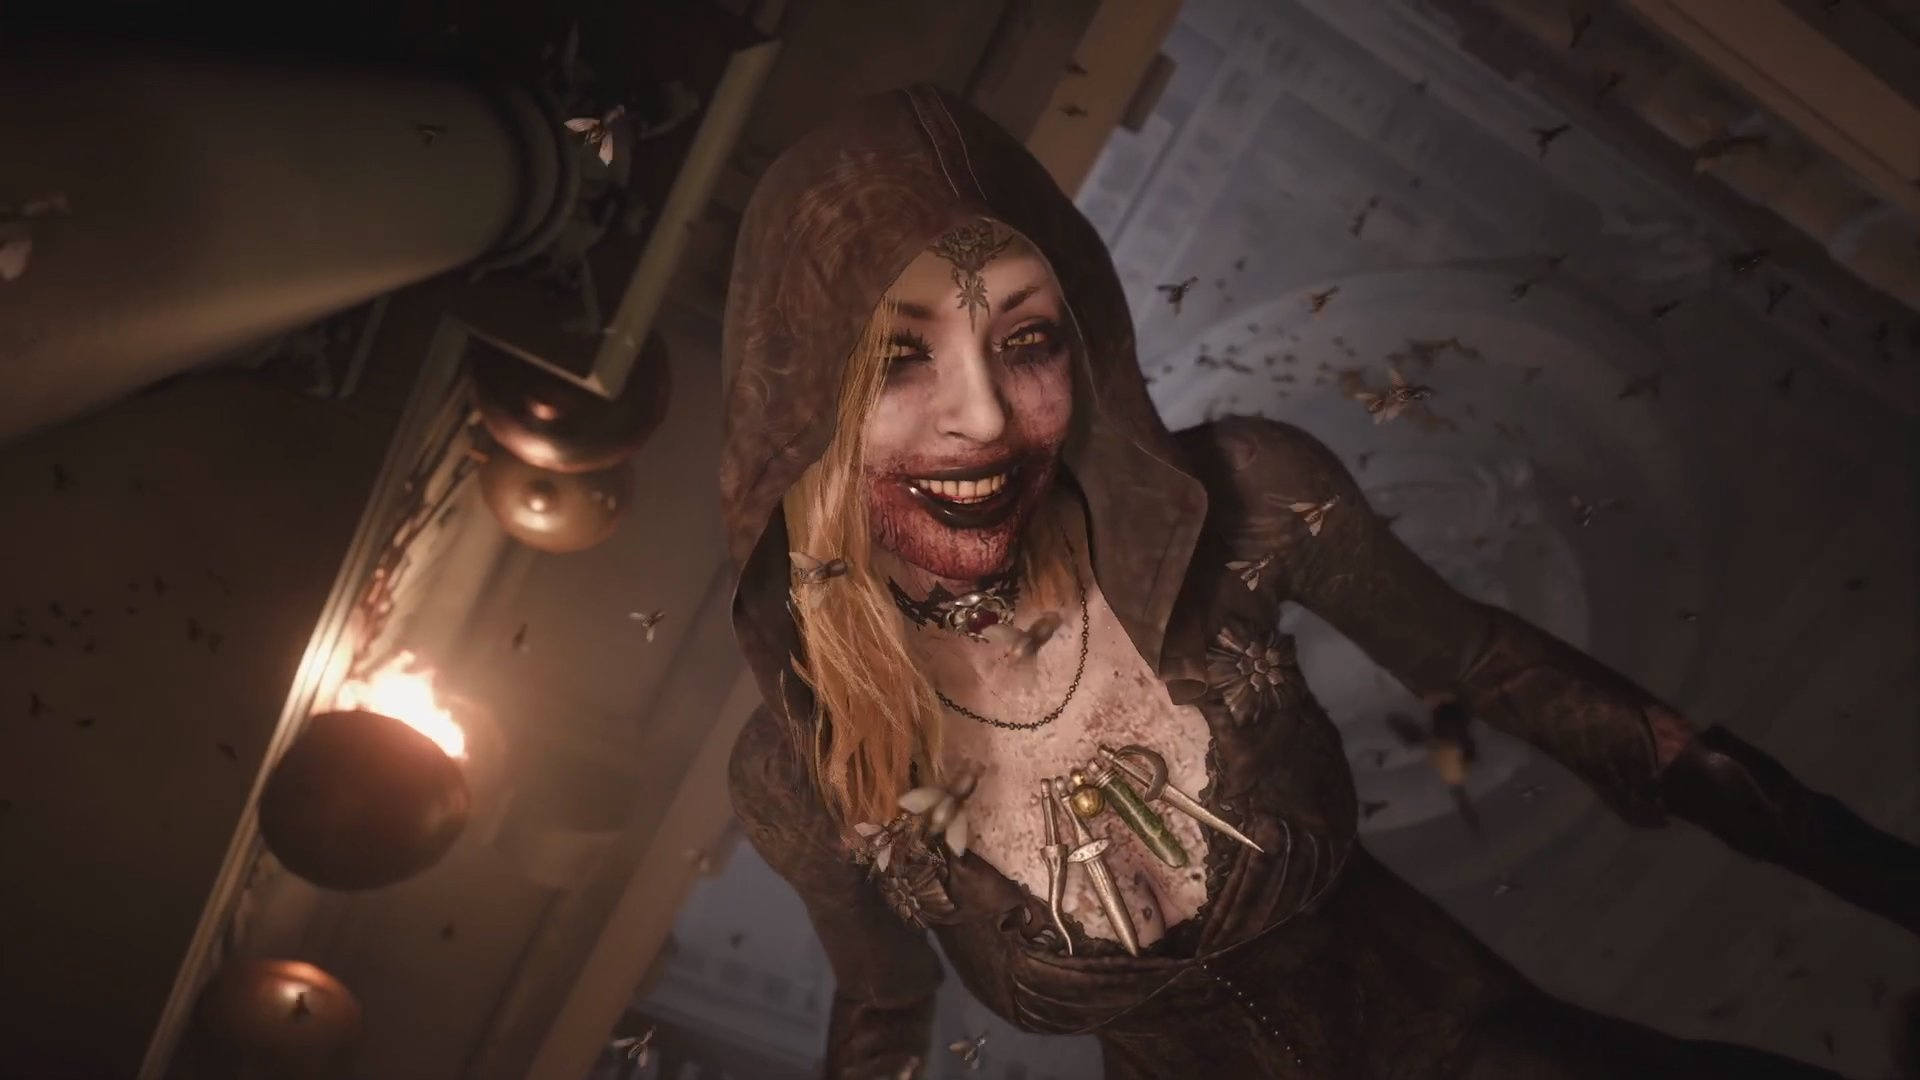 Шоу по Resident Evil Village: дата выхода, демо для PS5, трейлер, геймплей